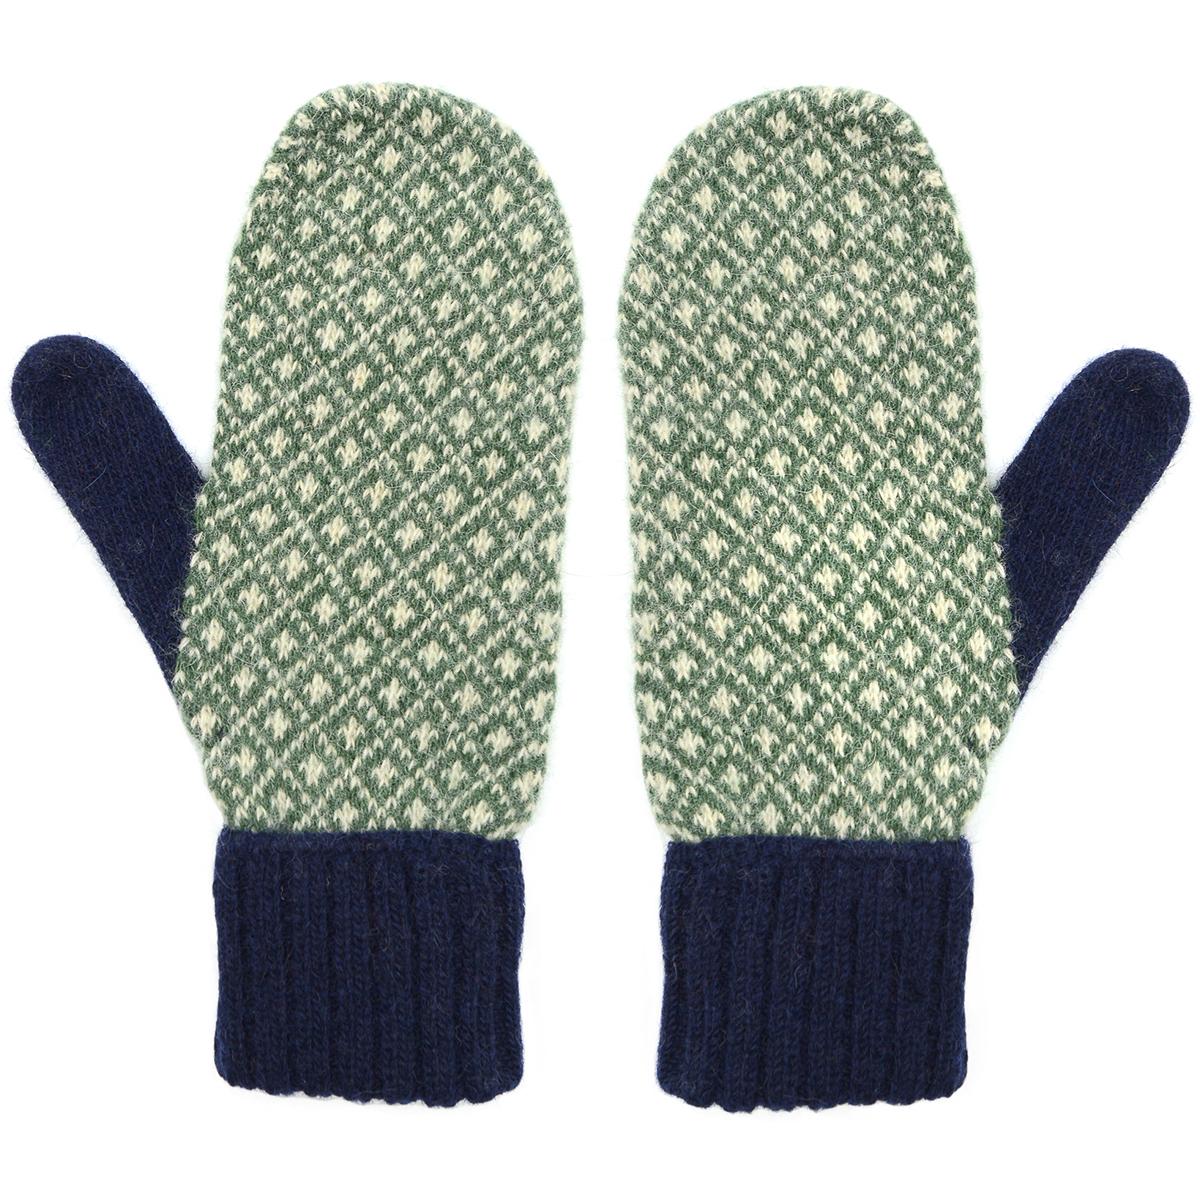 Navy and green intarsia mittens by Santacana